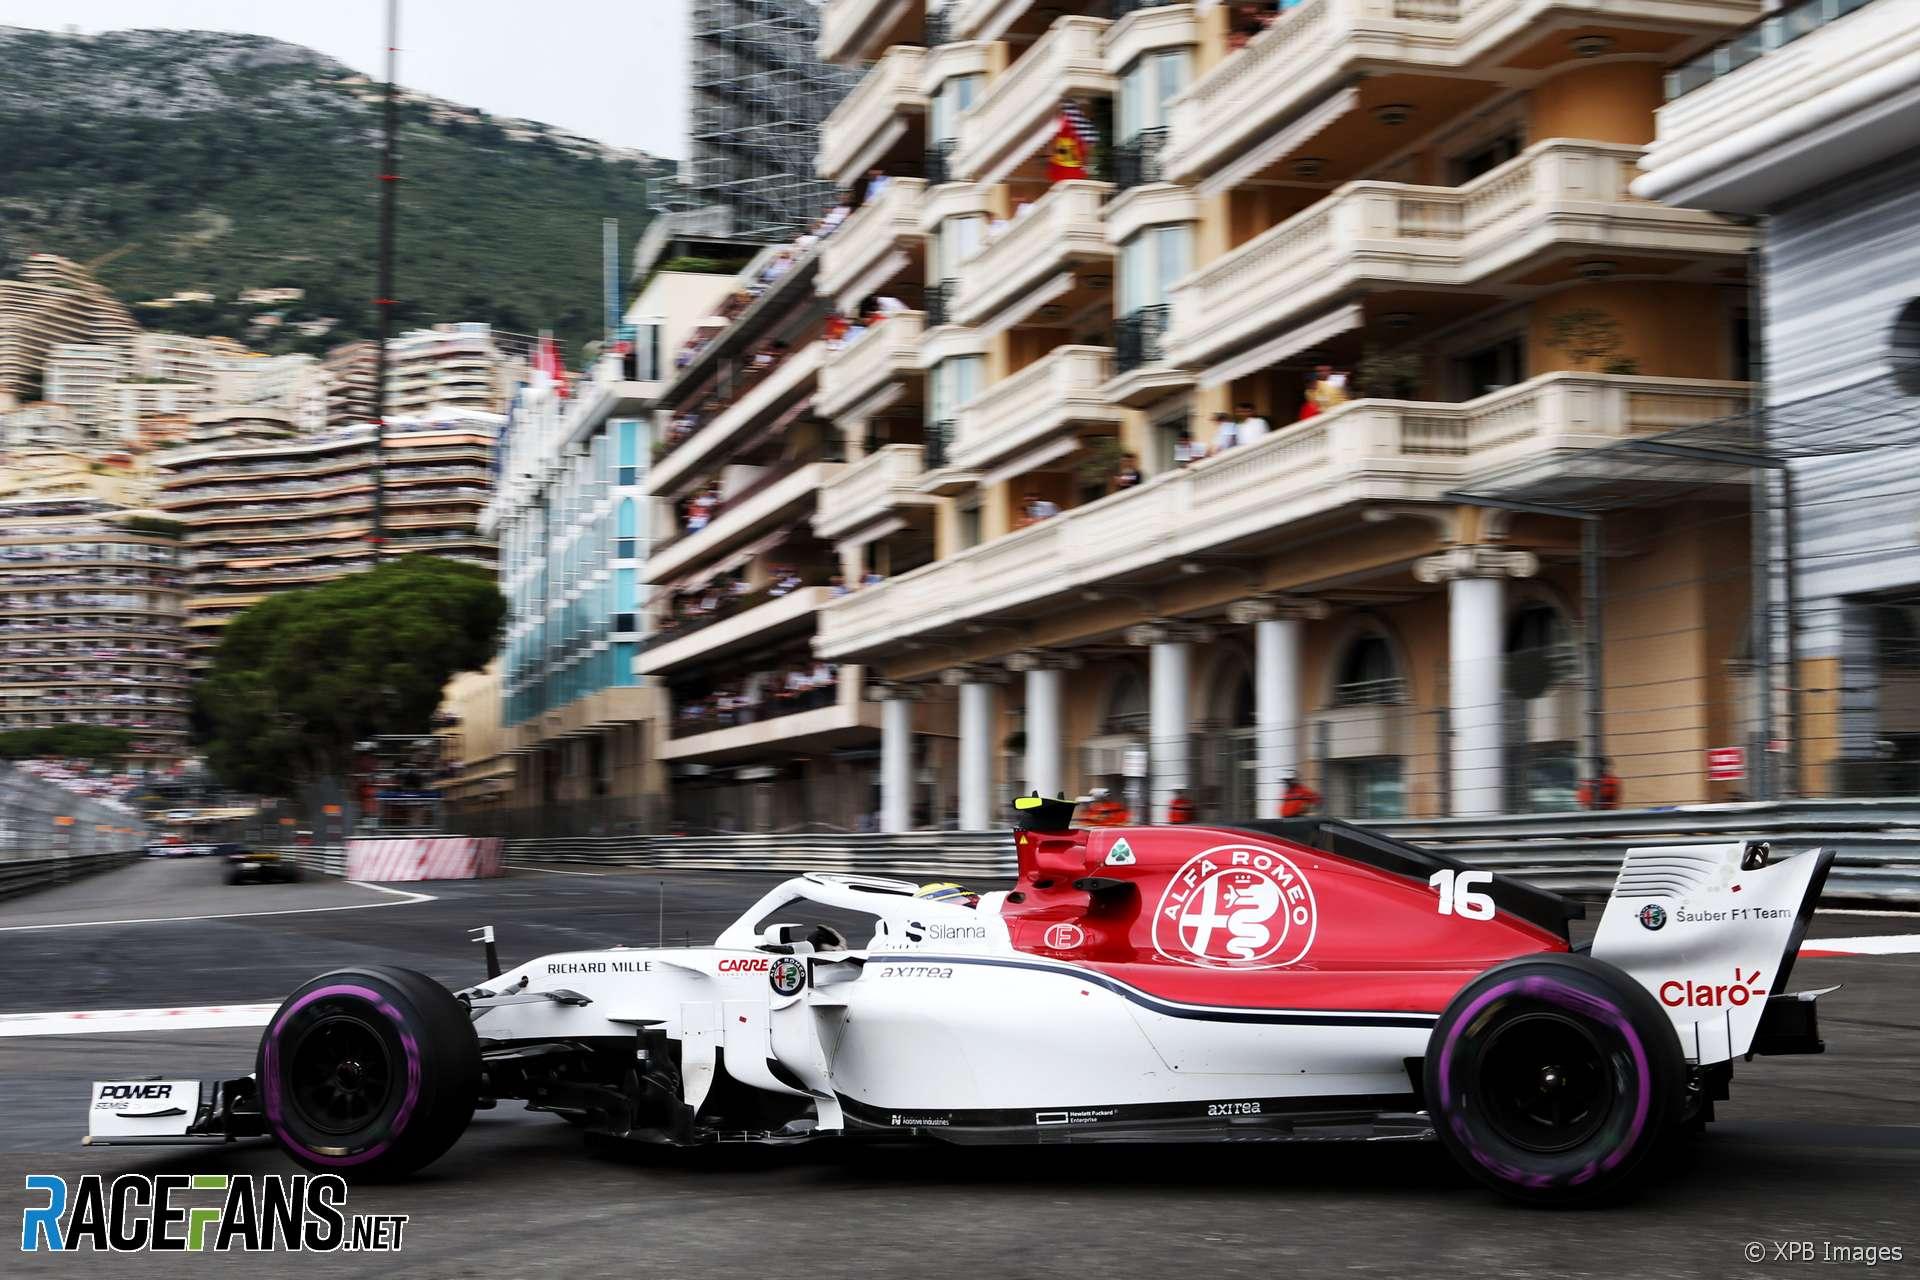 Charles Leclerc, Sauber, Monaco, 2018